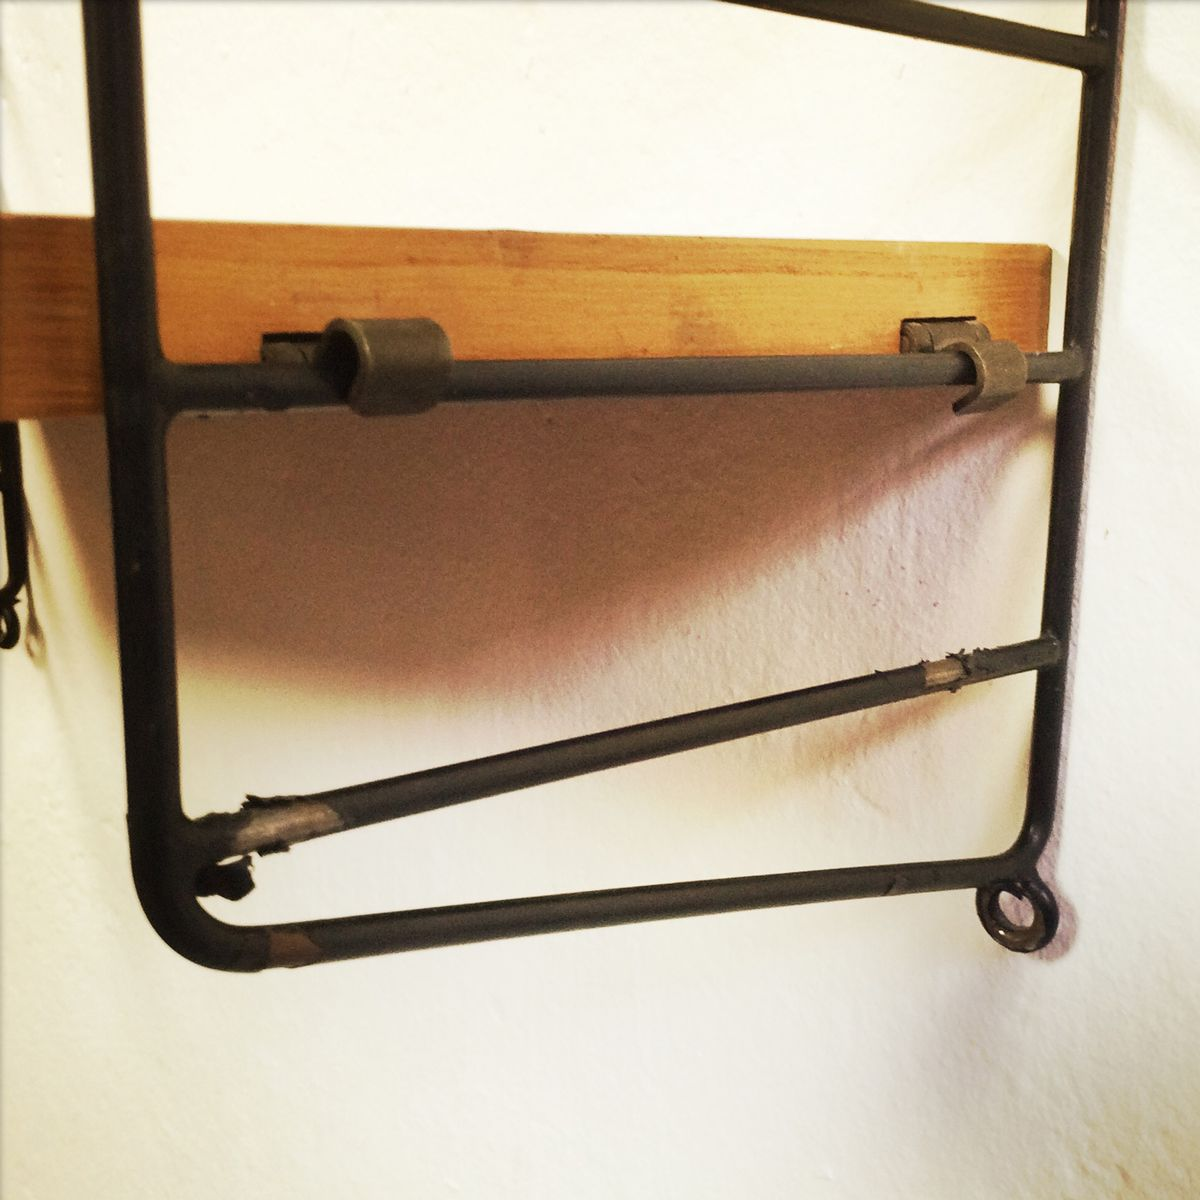 kleines modulares string wandregal bei pamono kaufen. Black Bedroom Furniture Sets. Home Design Ideas